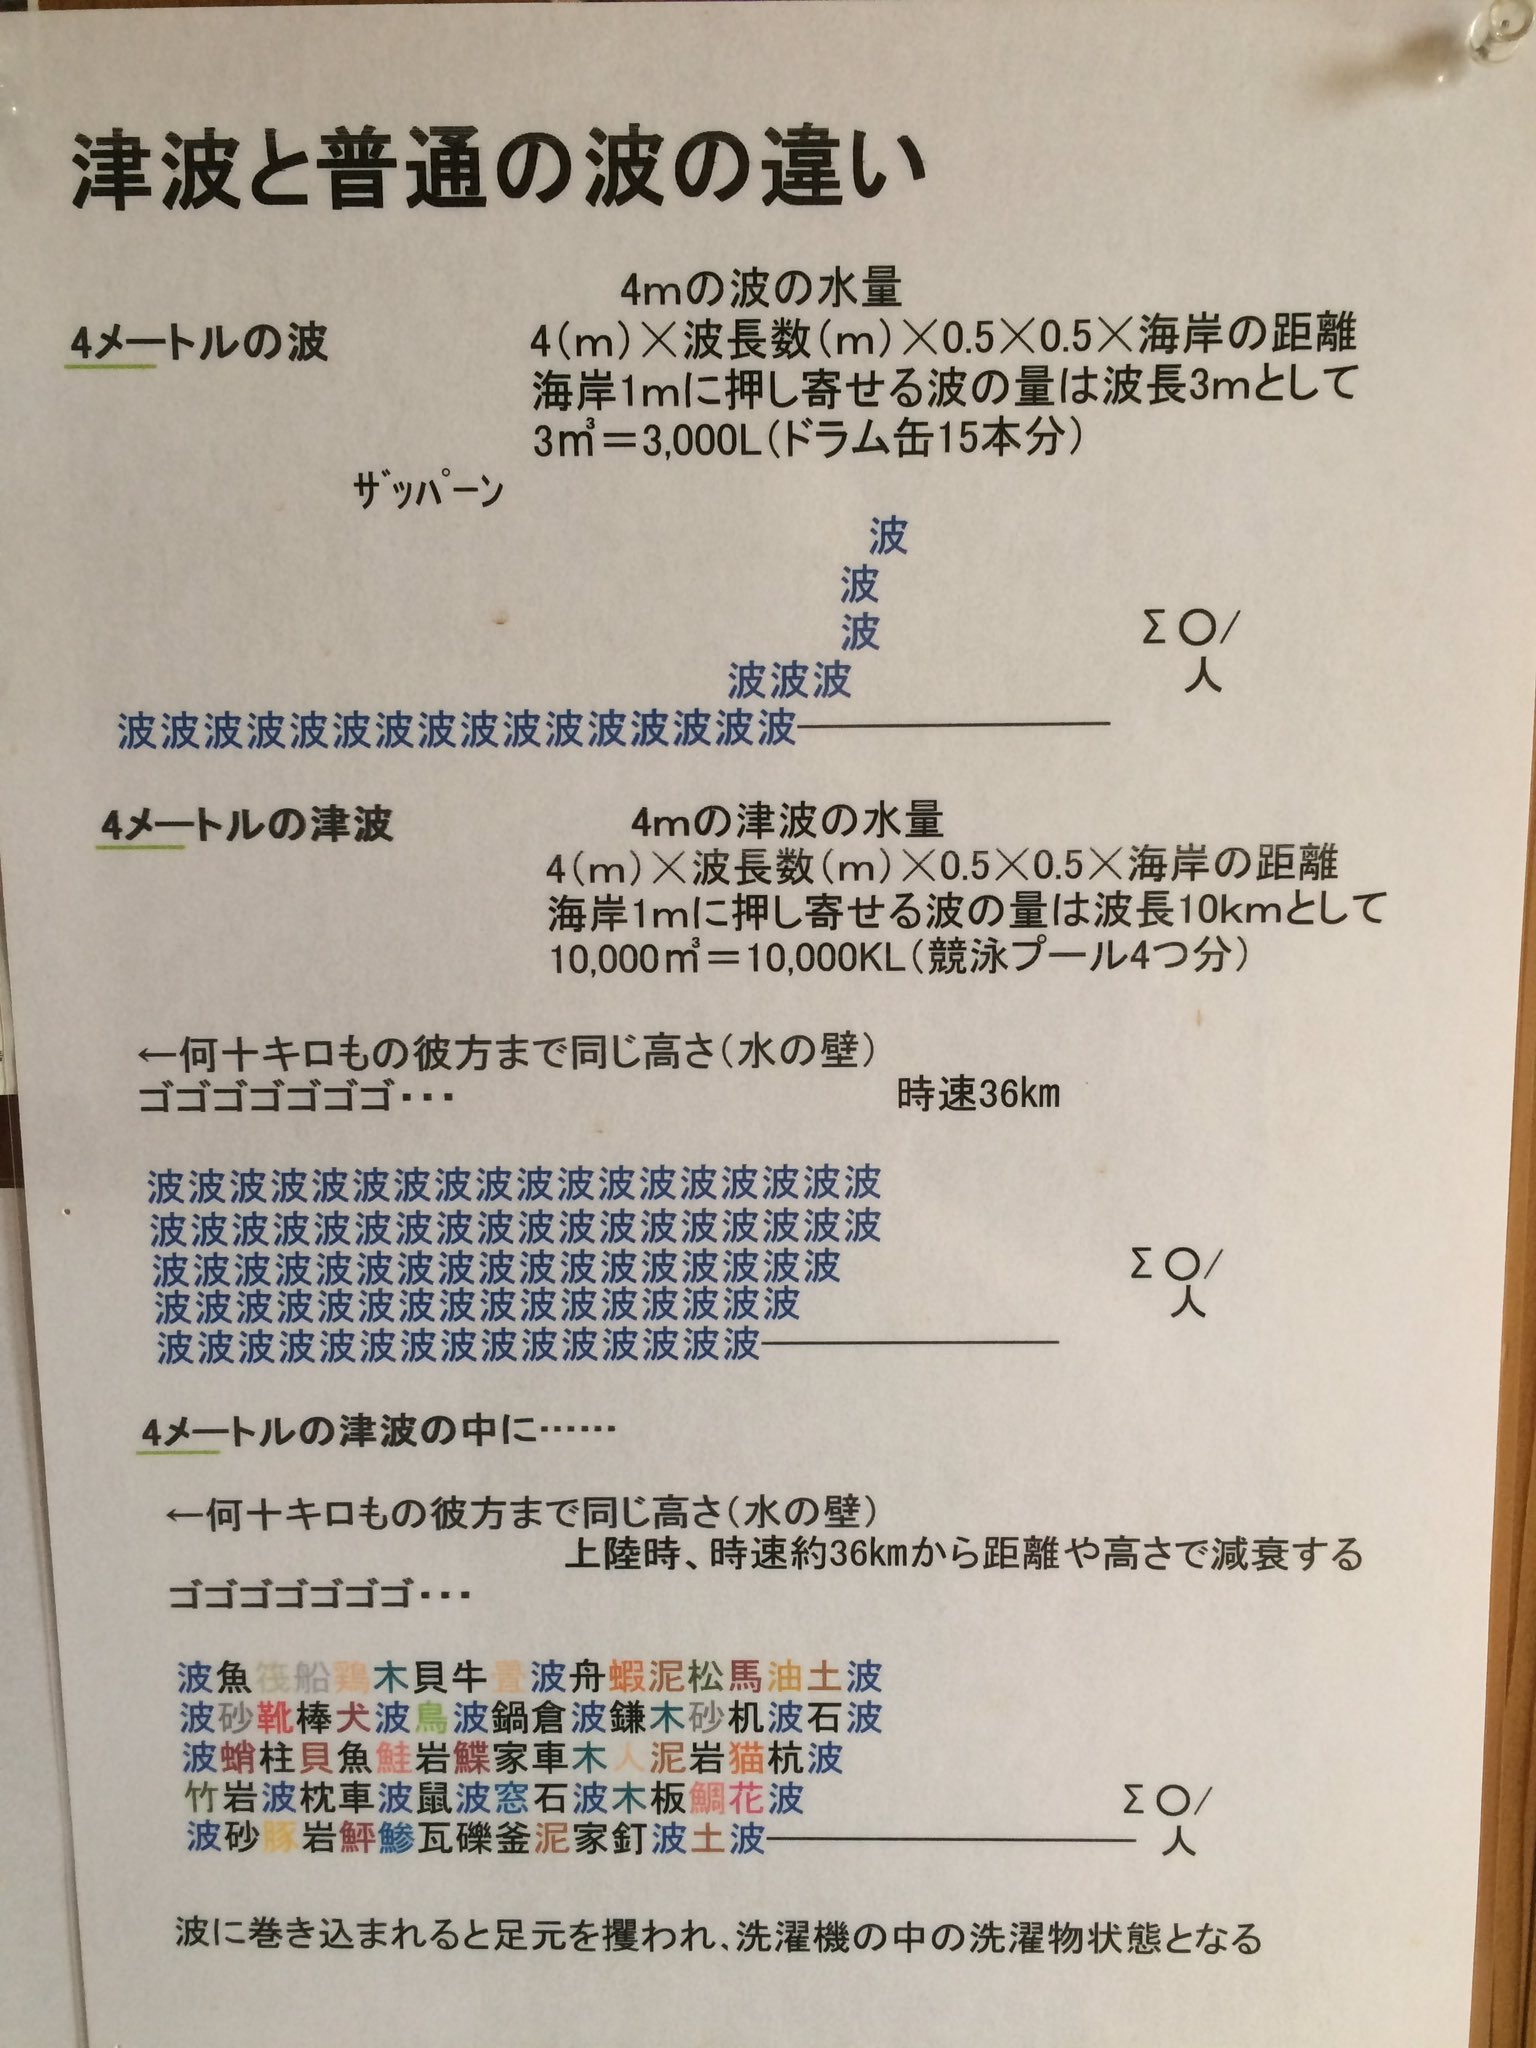 tsunami_kyoukun (1)